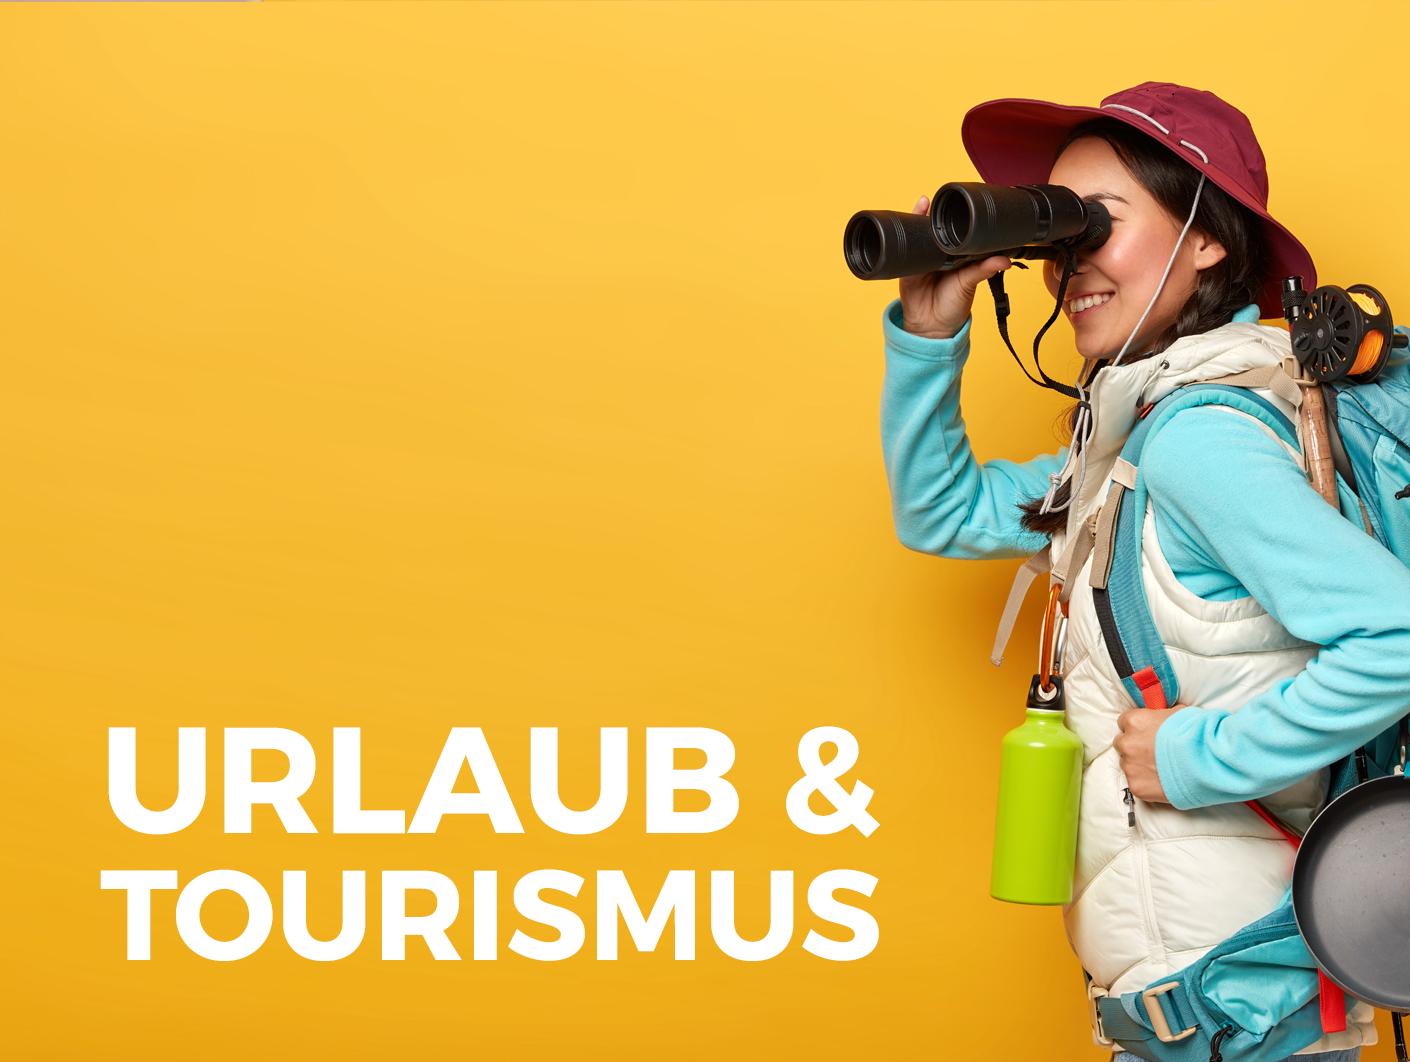 urlaub-tourismus